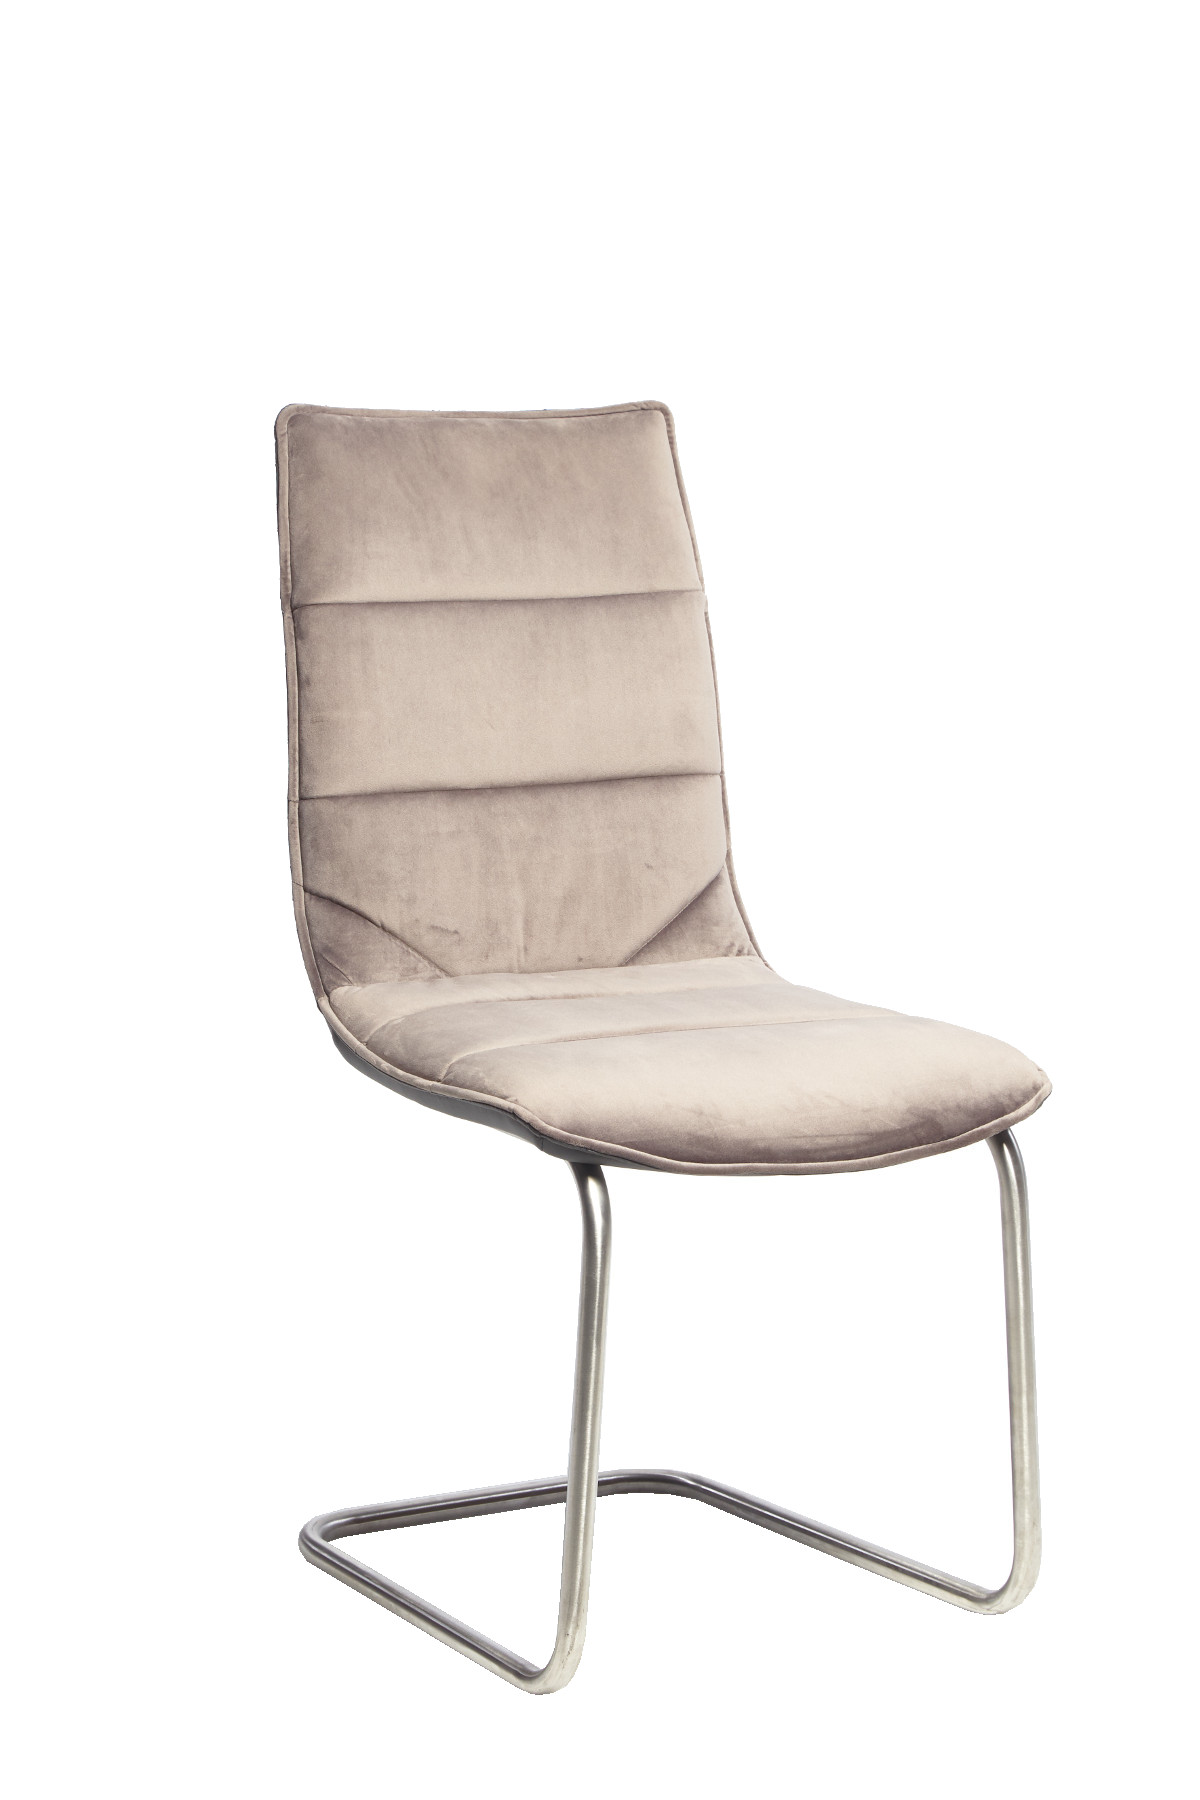 Sara Grey Dining Chair